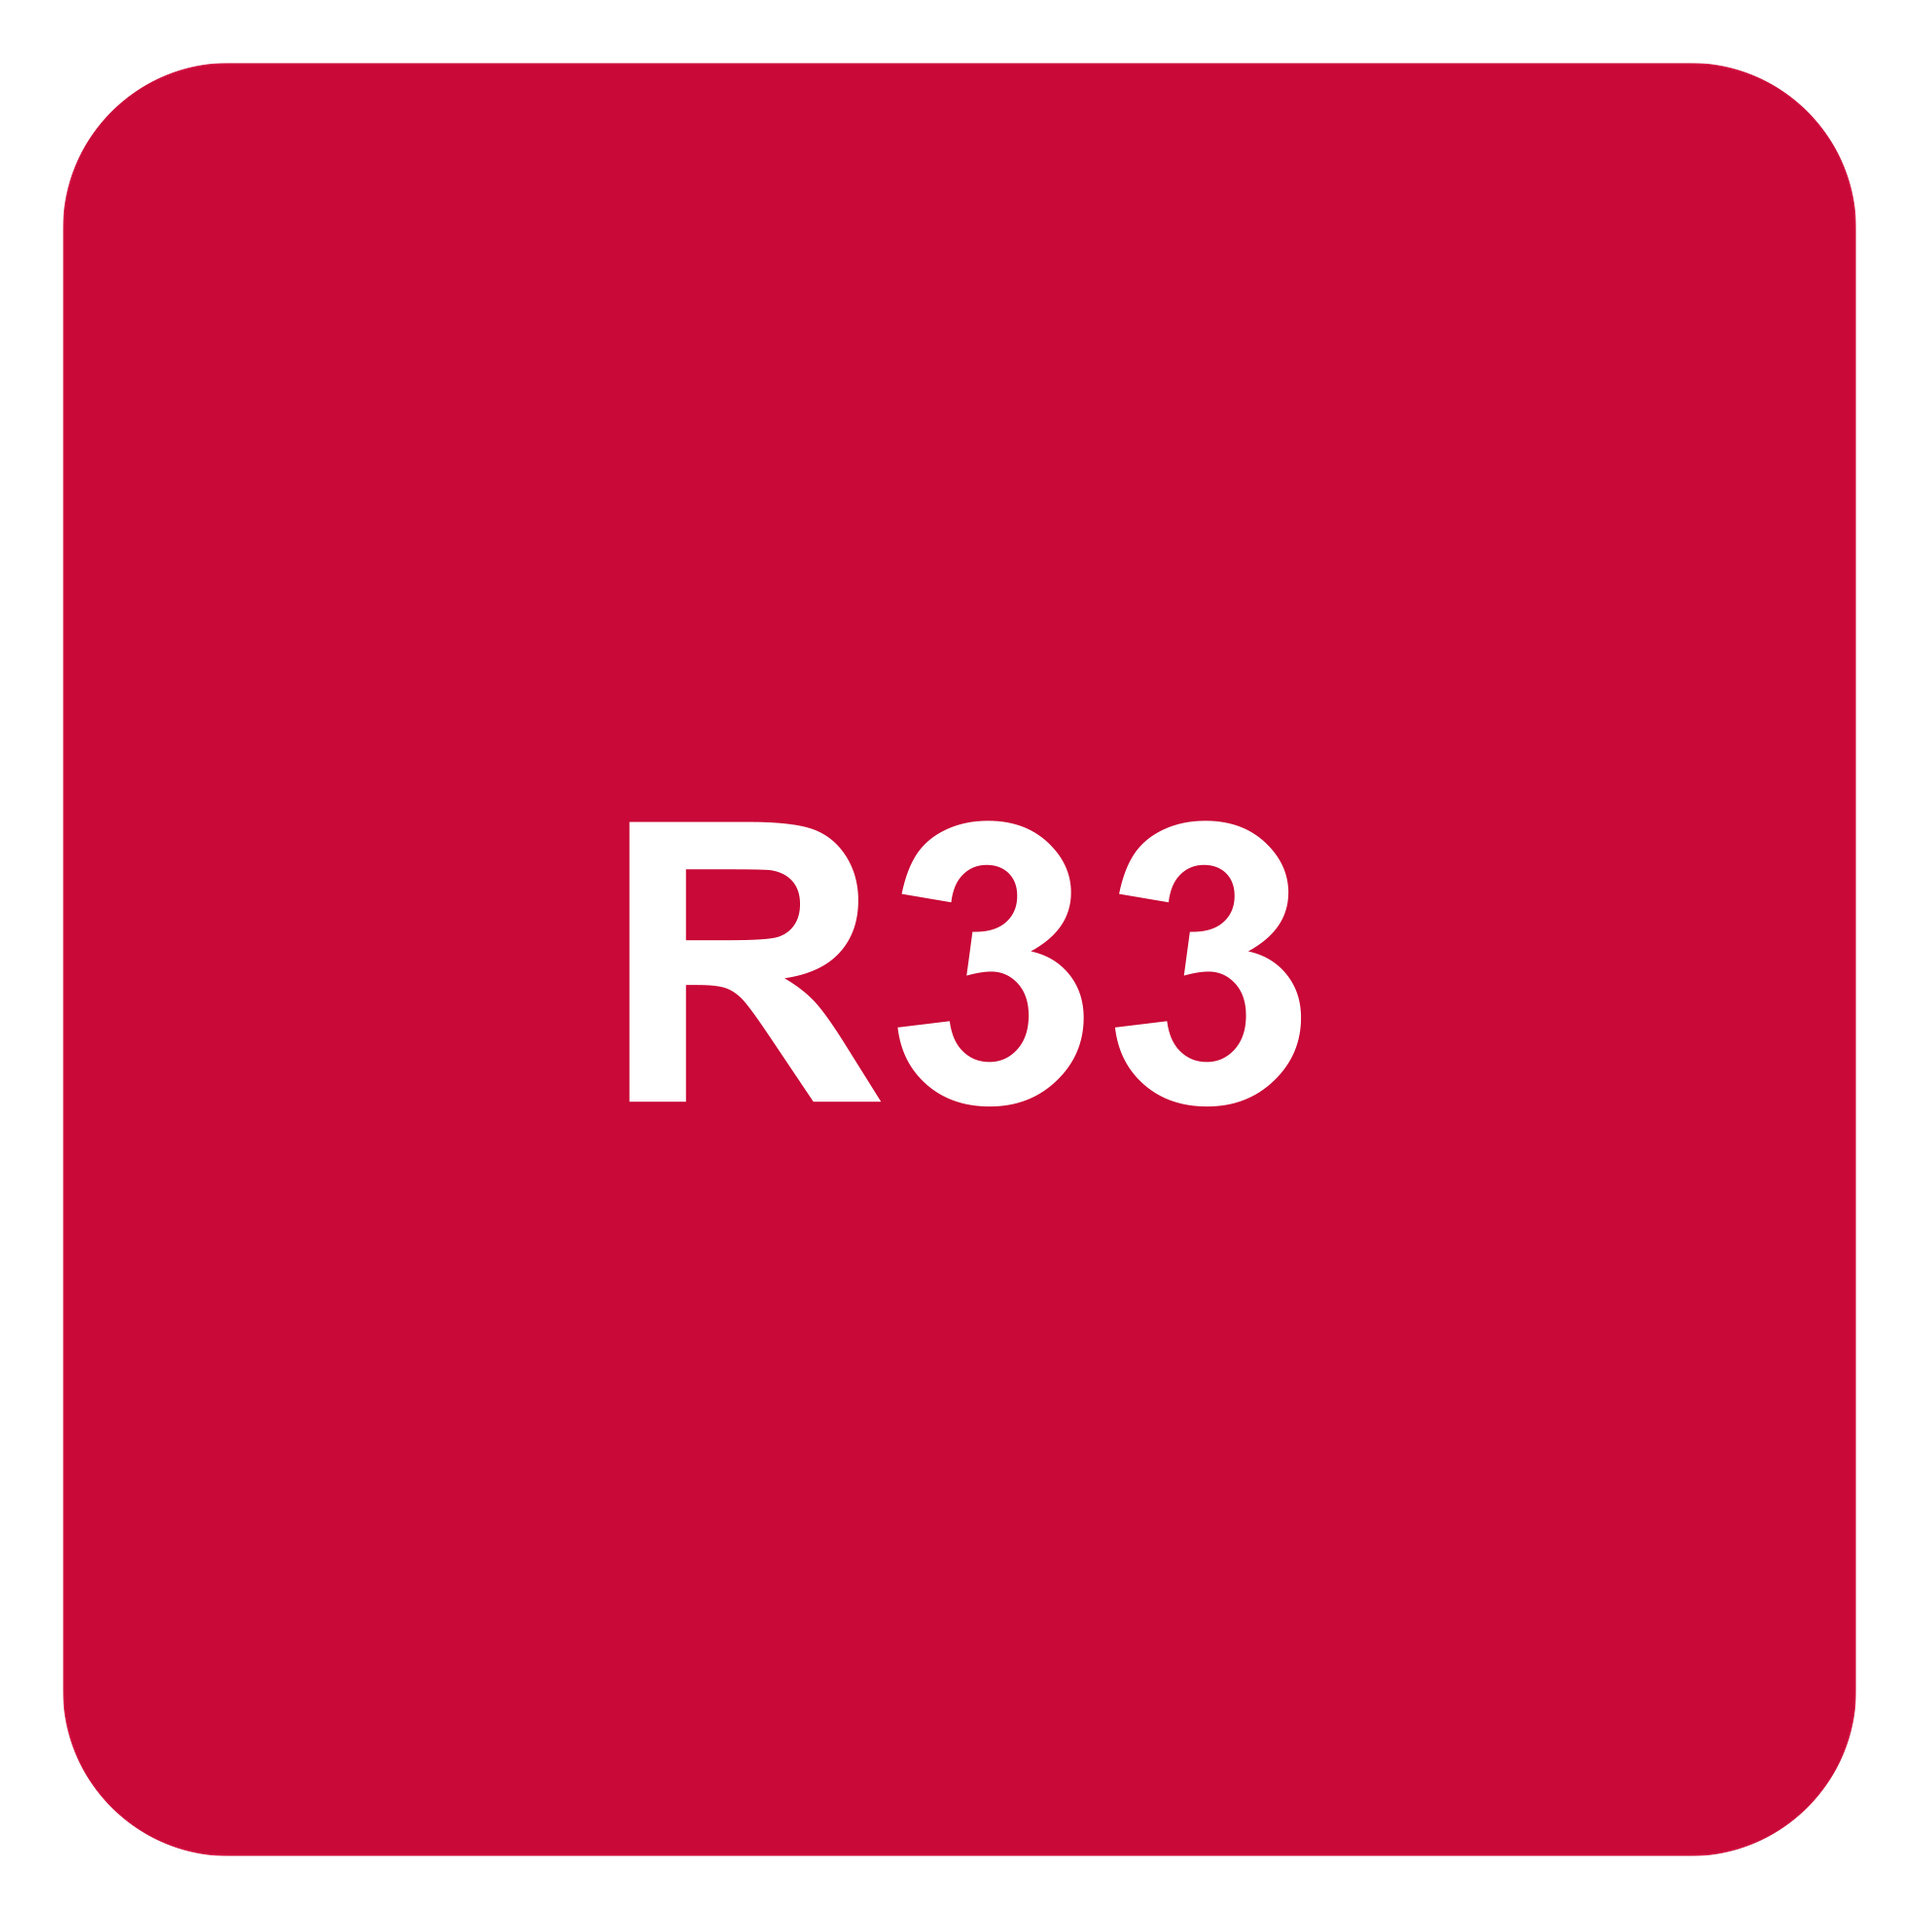 R33 SKYLINE